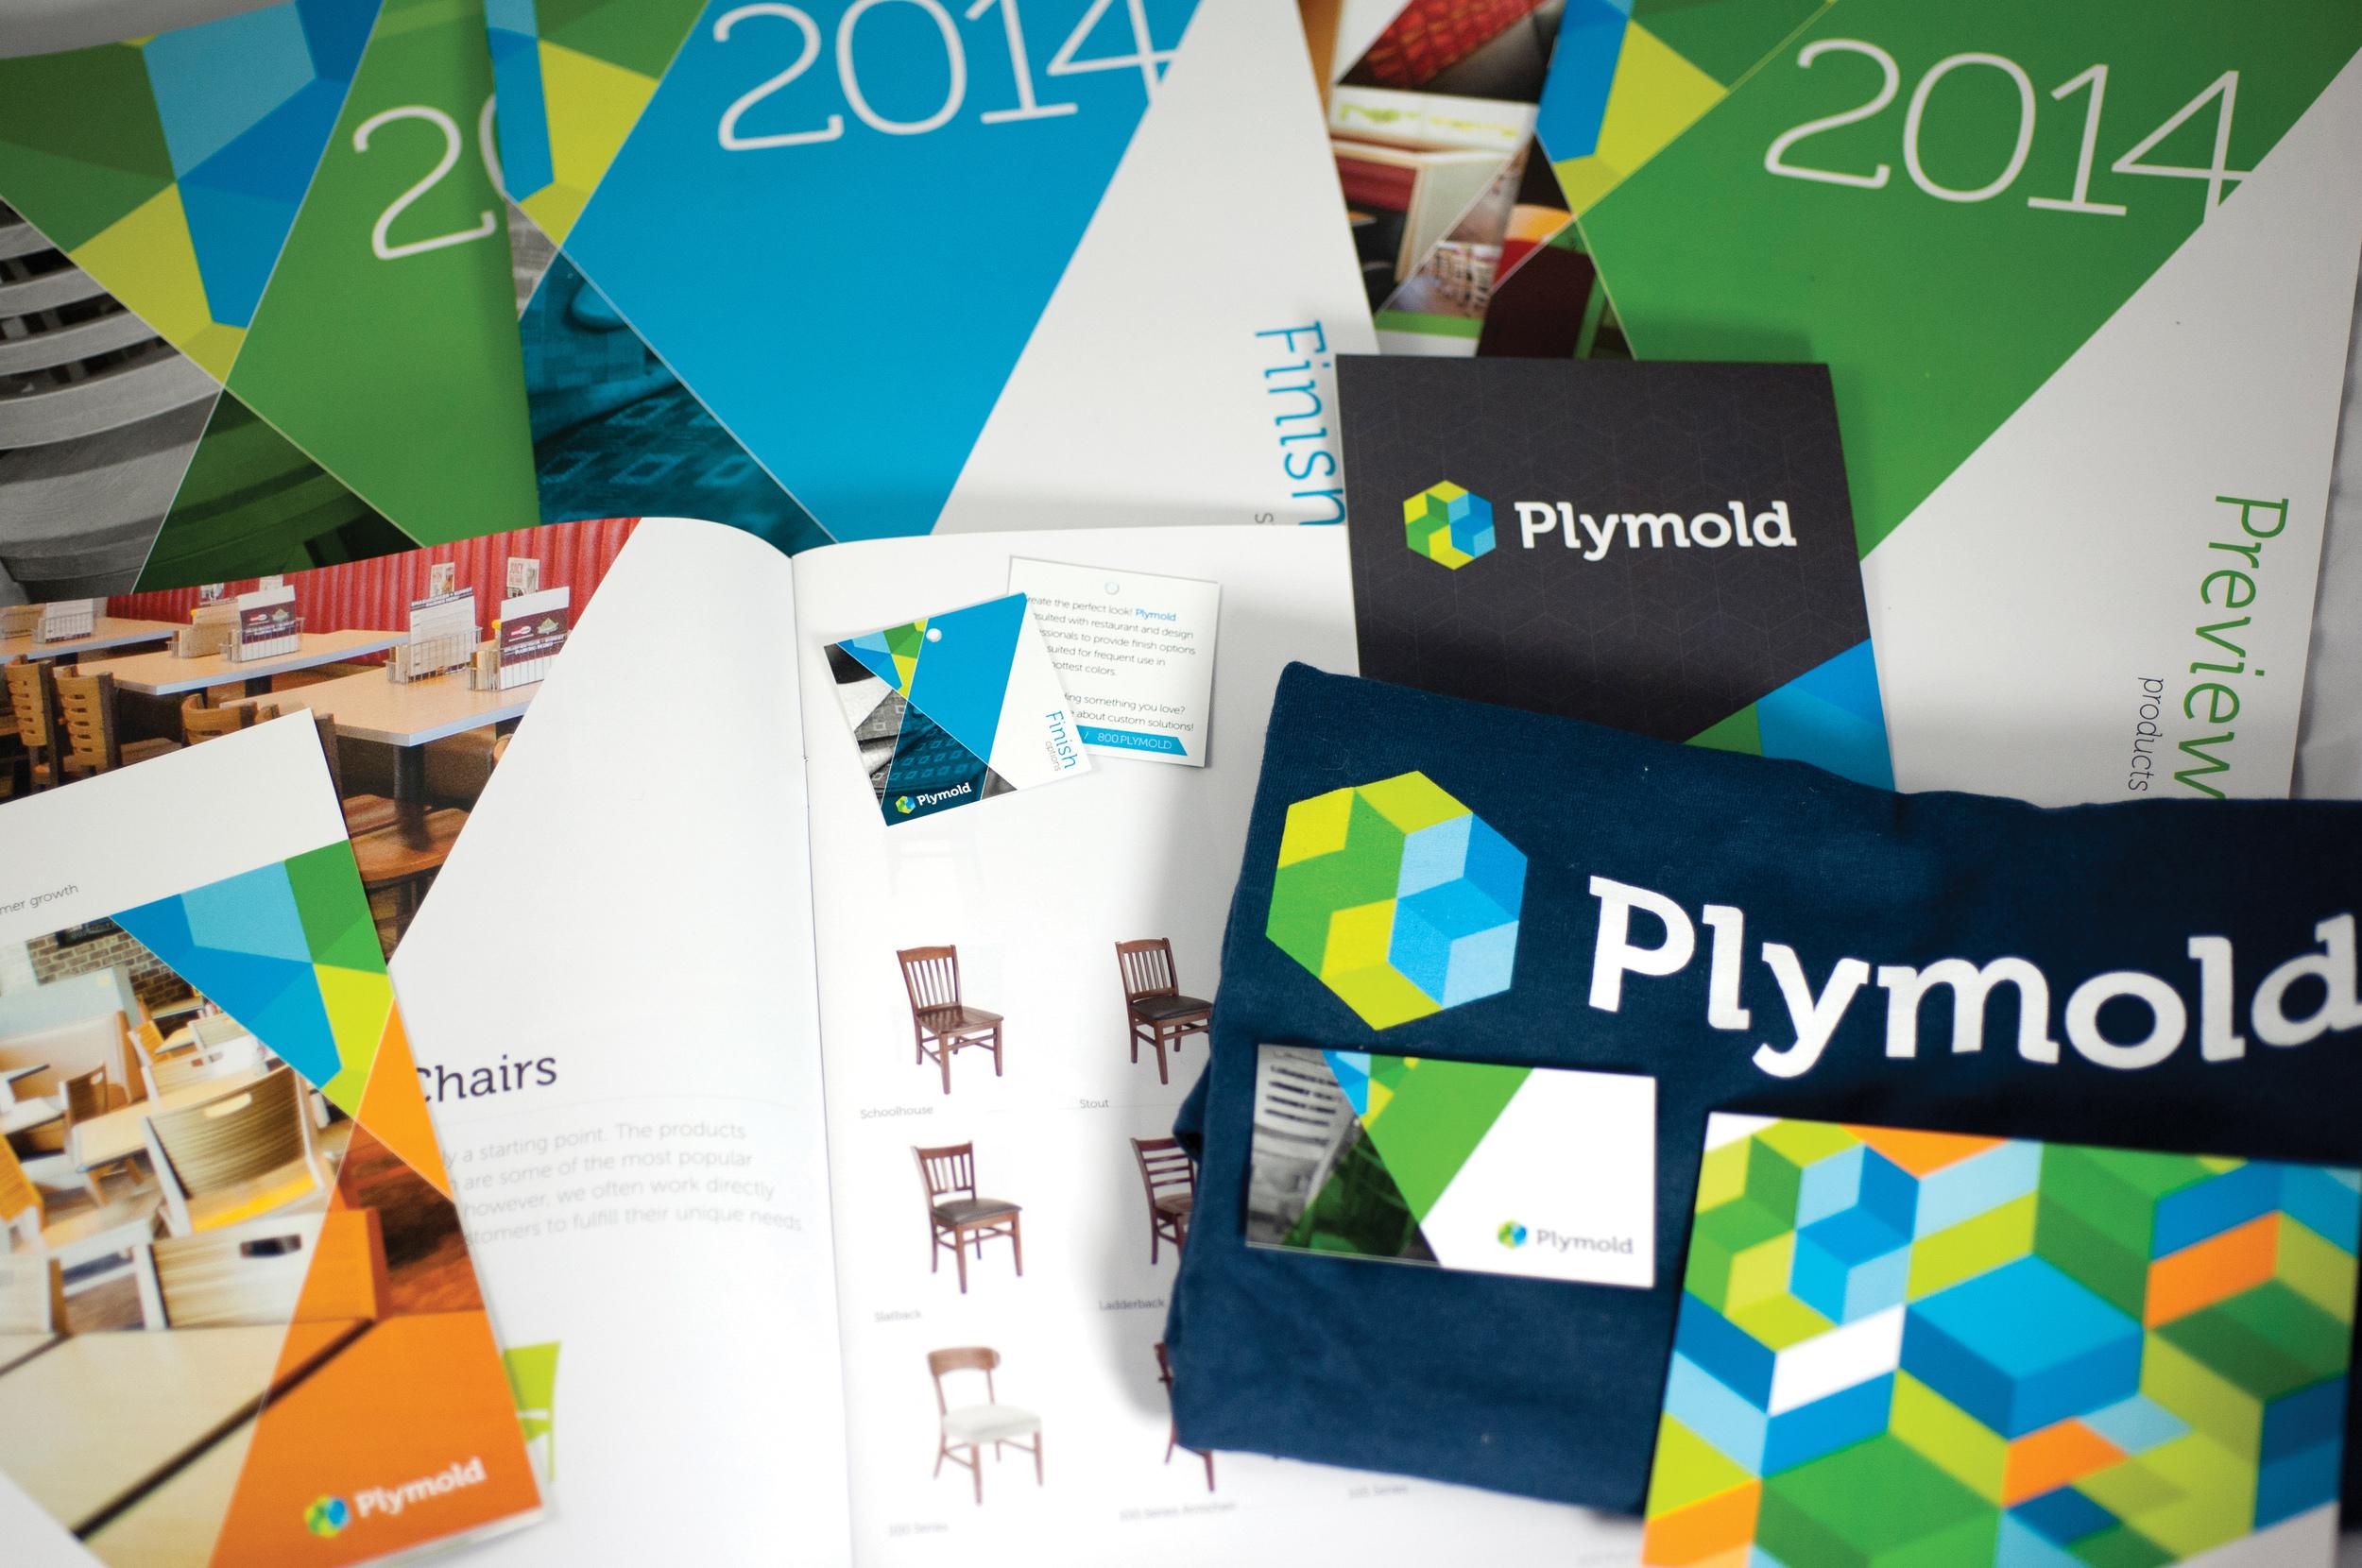 PlymoldBrandAssets